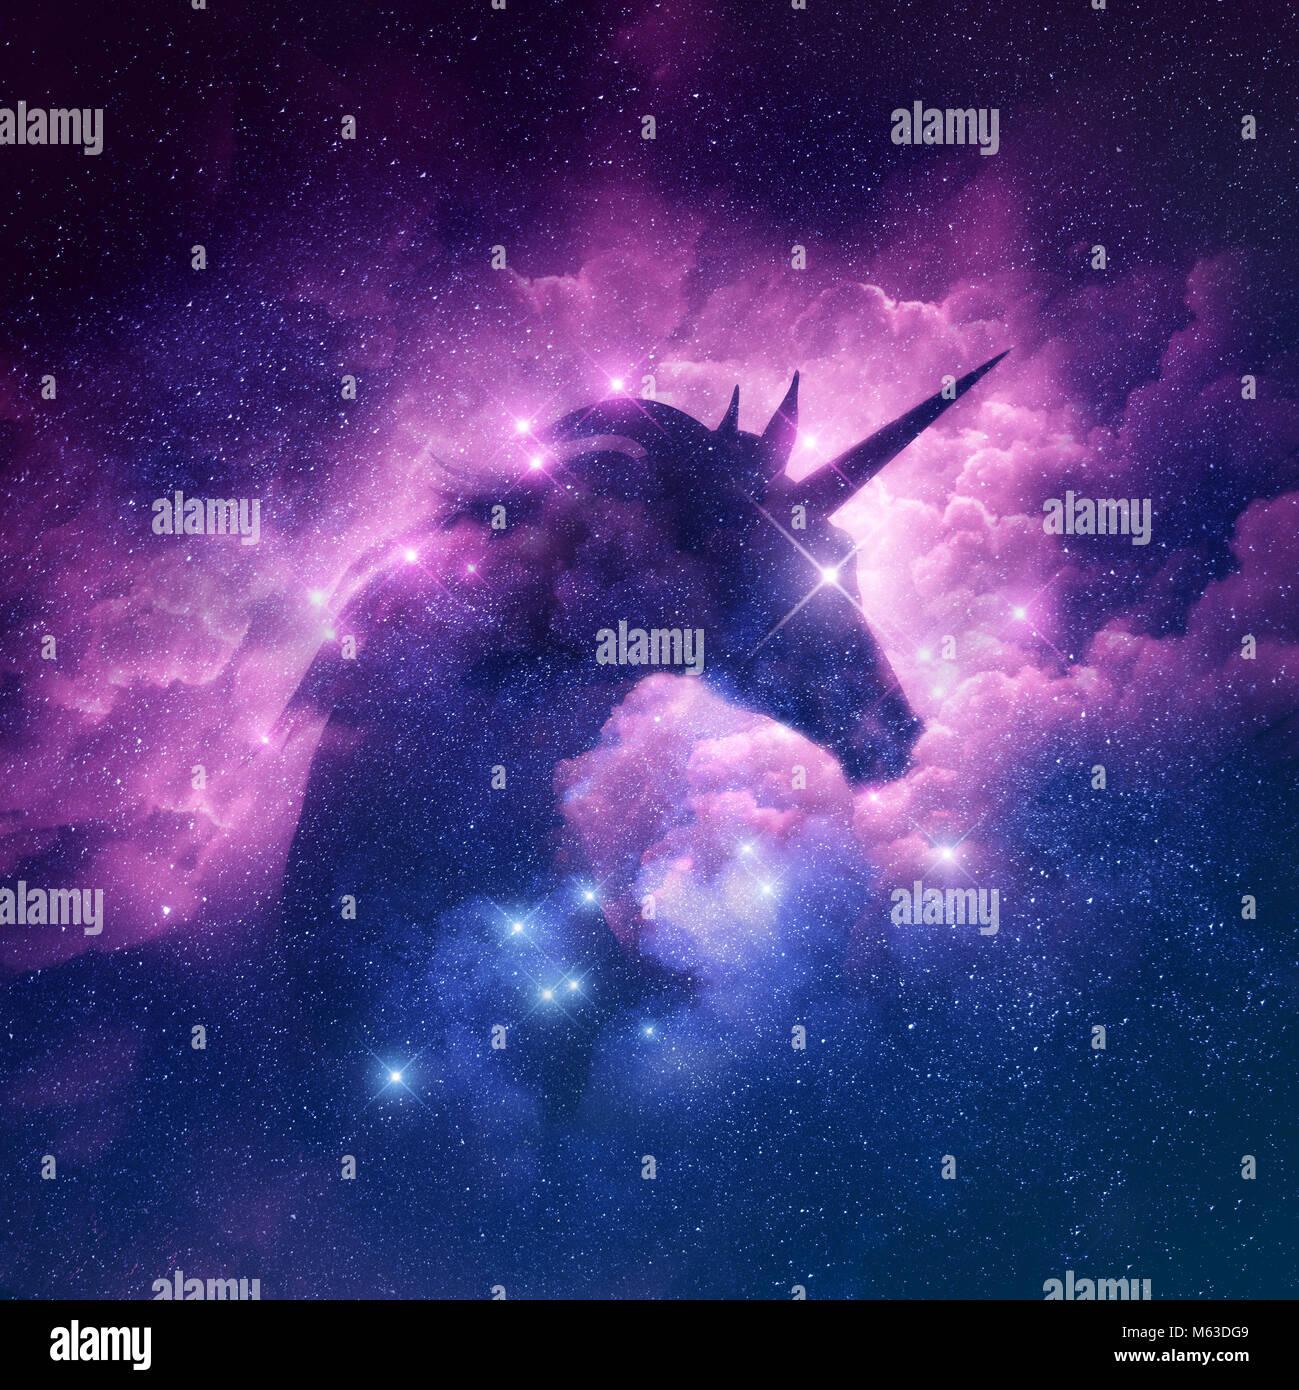 A unicorn silhouette in a galaxy nebula cloud. Raster illustration. - Stock Image